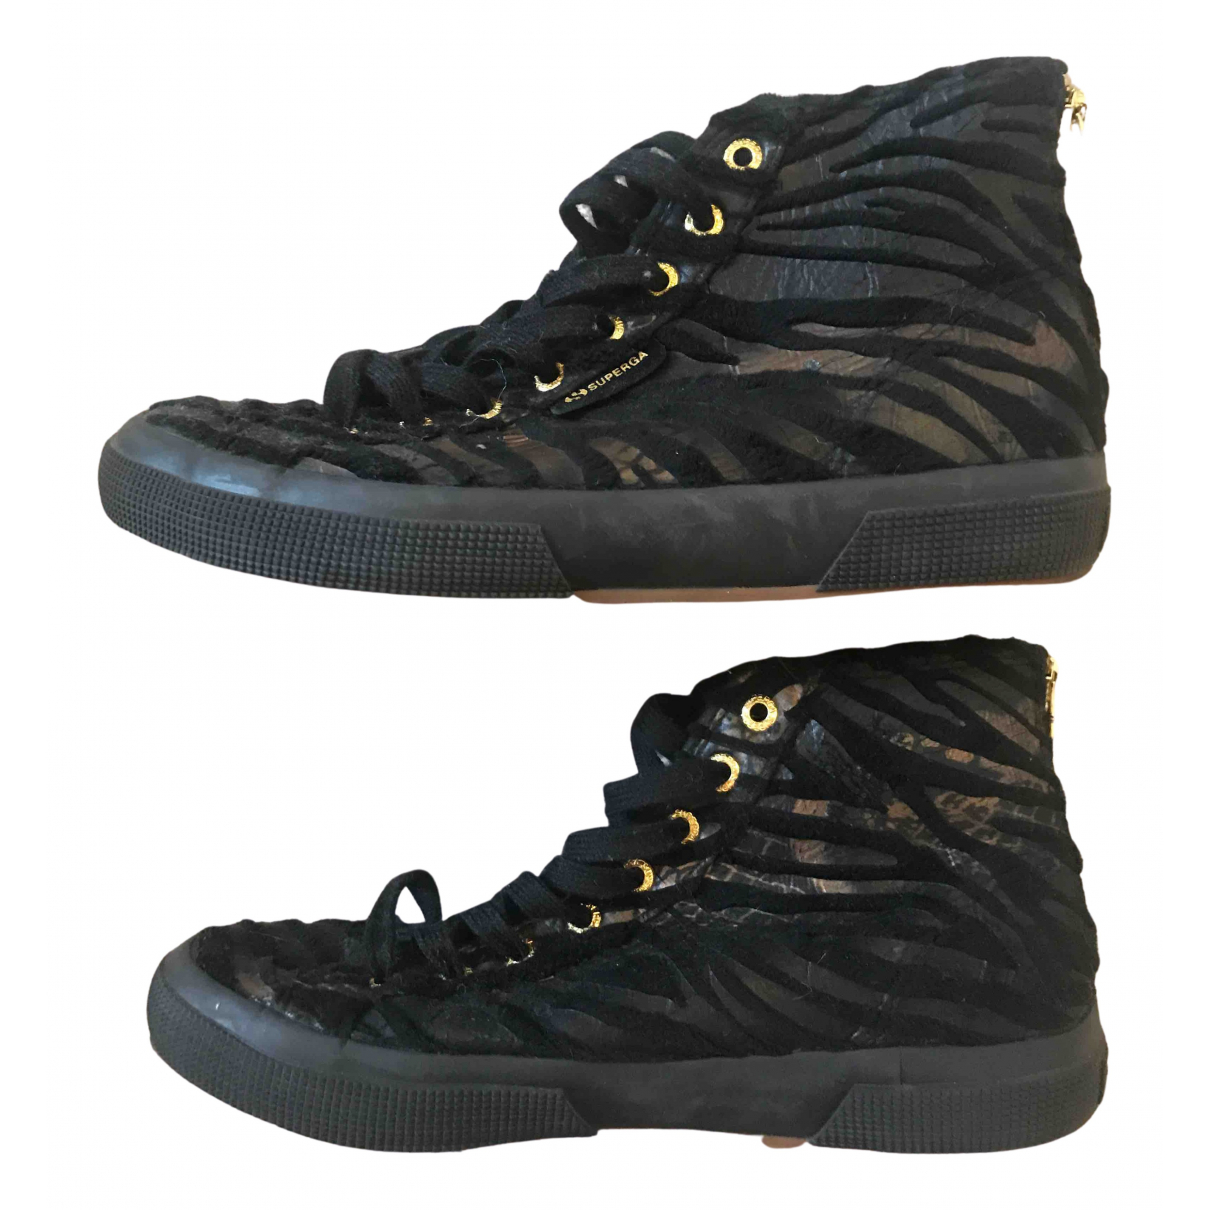 Superga N Black Rubber Heels for Women 39 EU